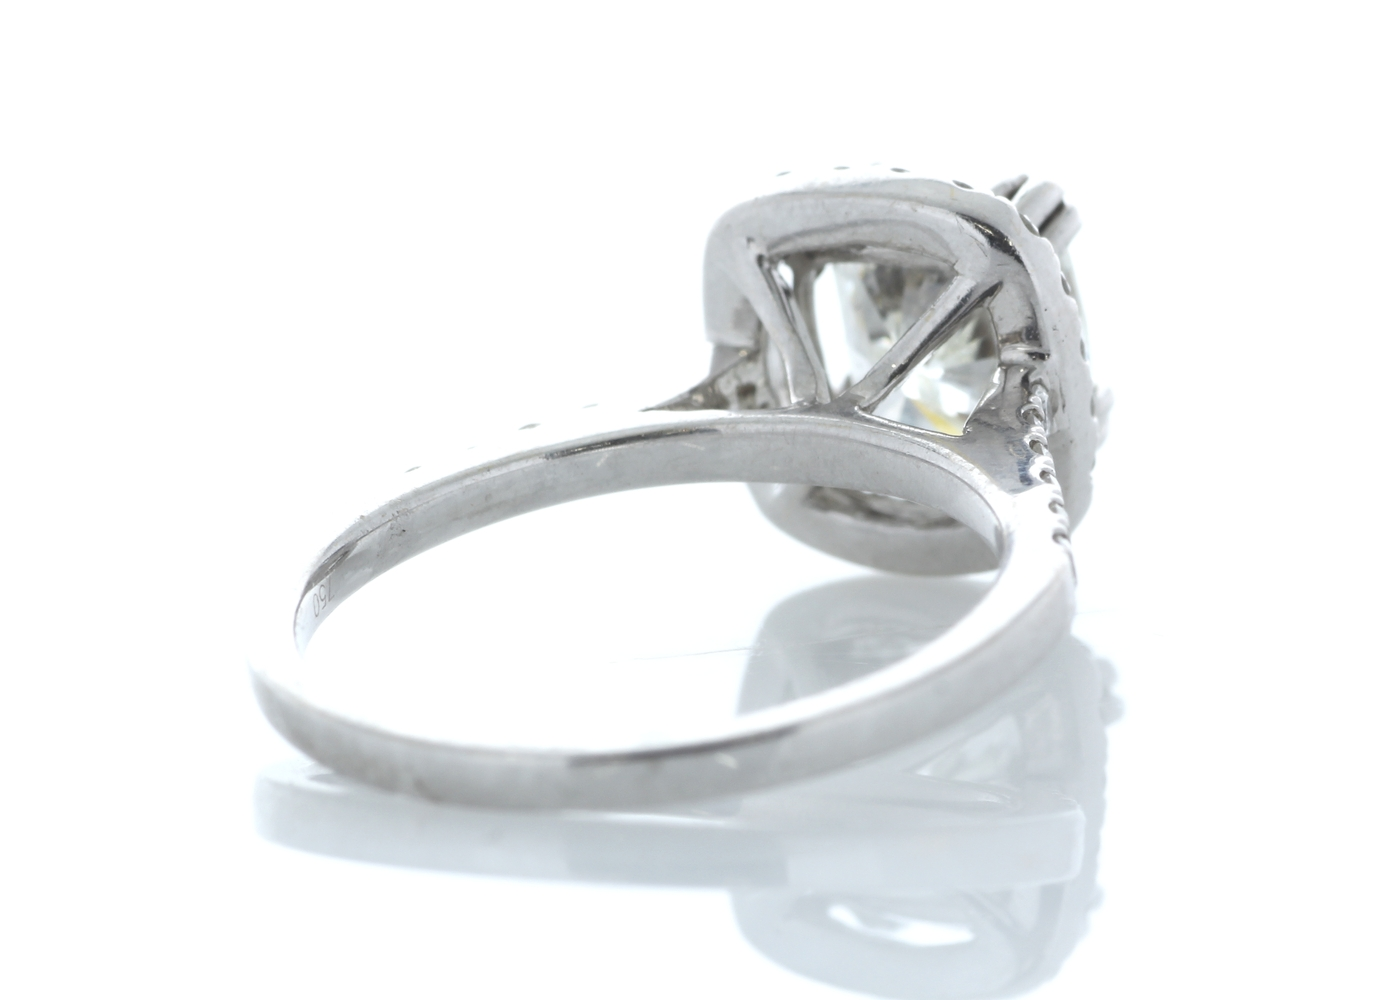 18ct White Gold Halo Set Ring 2.63 Carats - Image 3 of 4